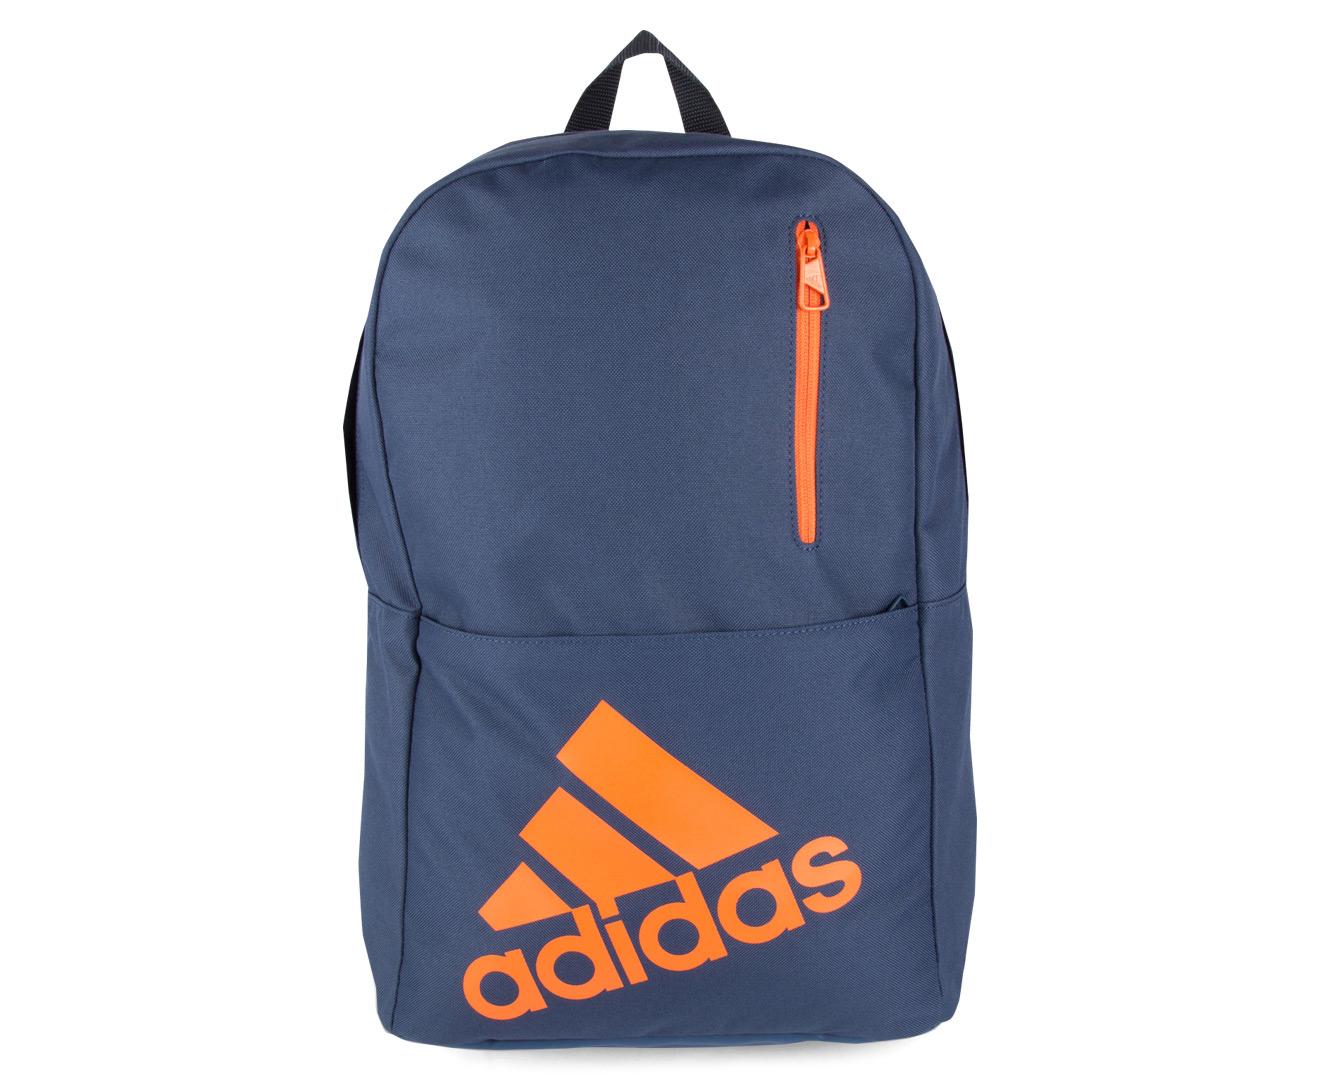 b8f407138ce44 Buy adidas e backpack